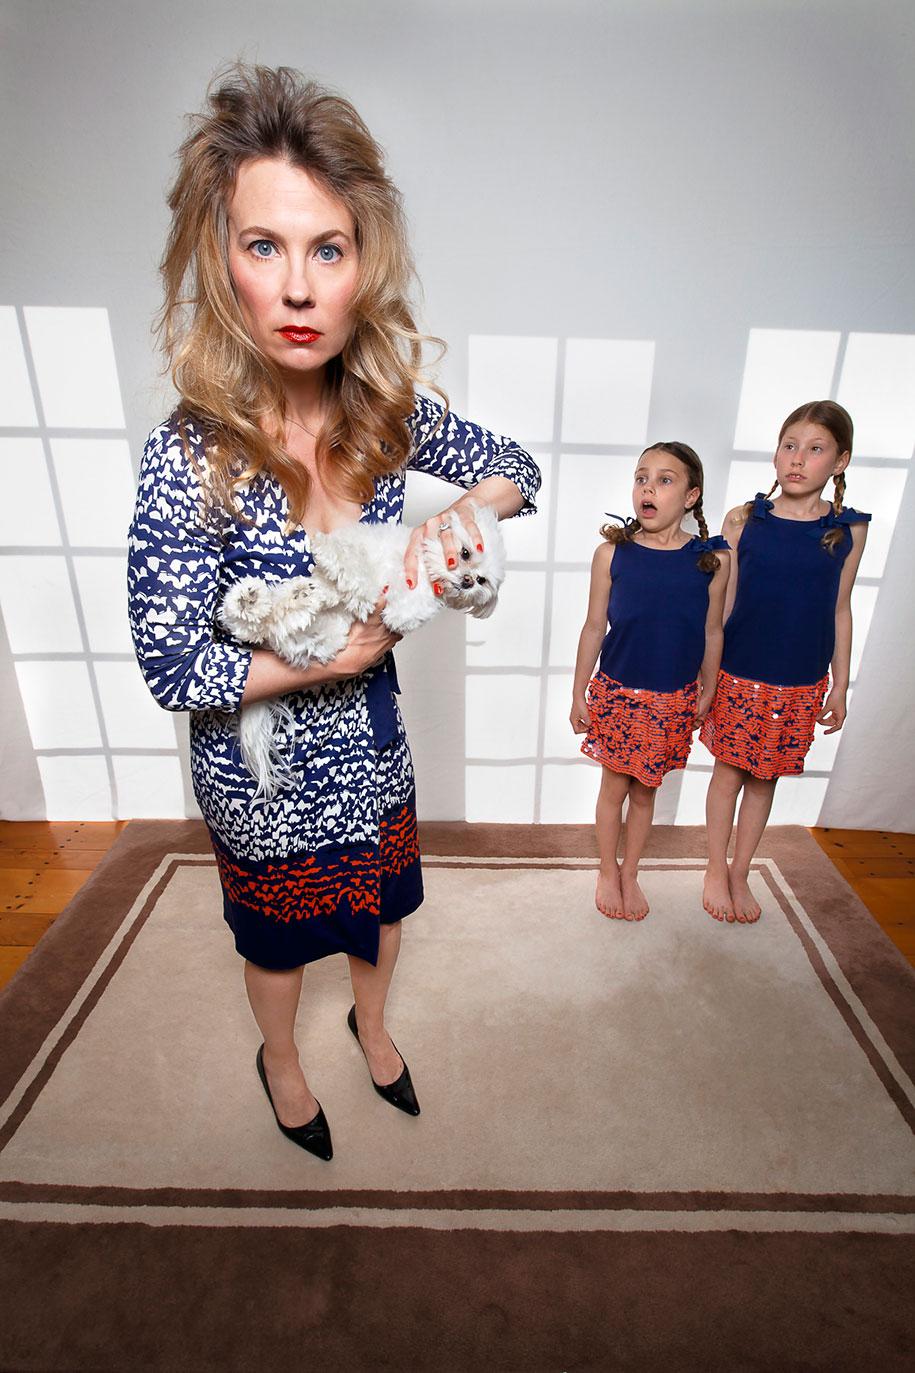 domestic-bliss-family-portraits-susan-colpich-11